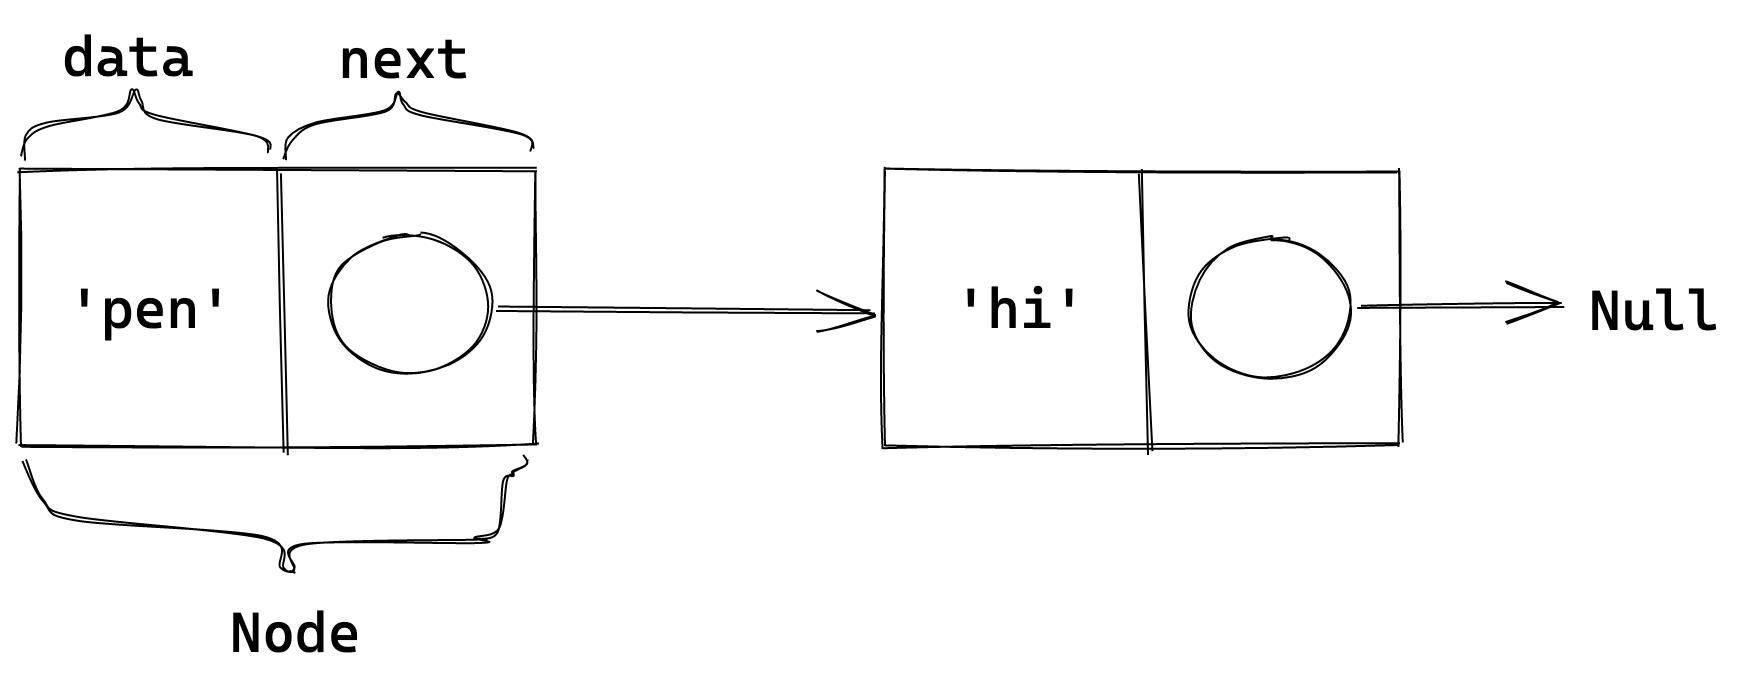 algo-node-img